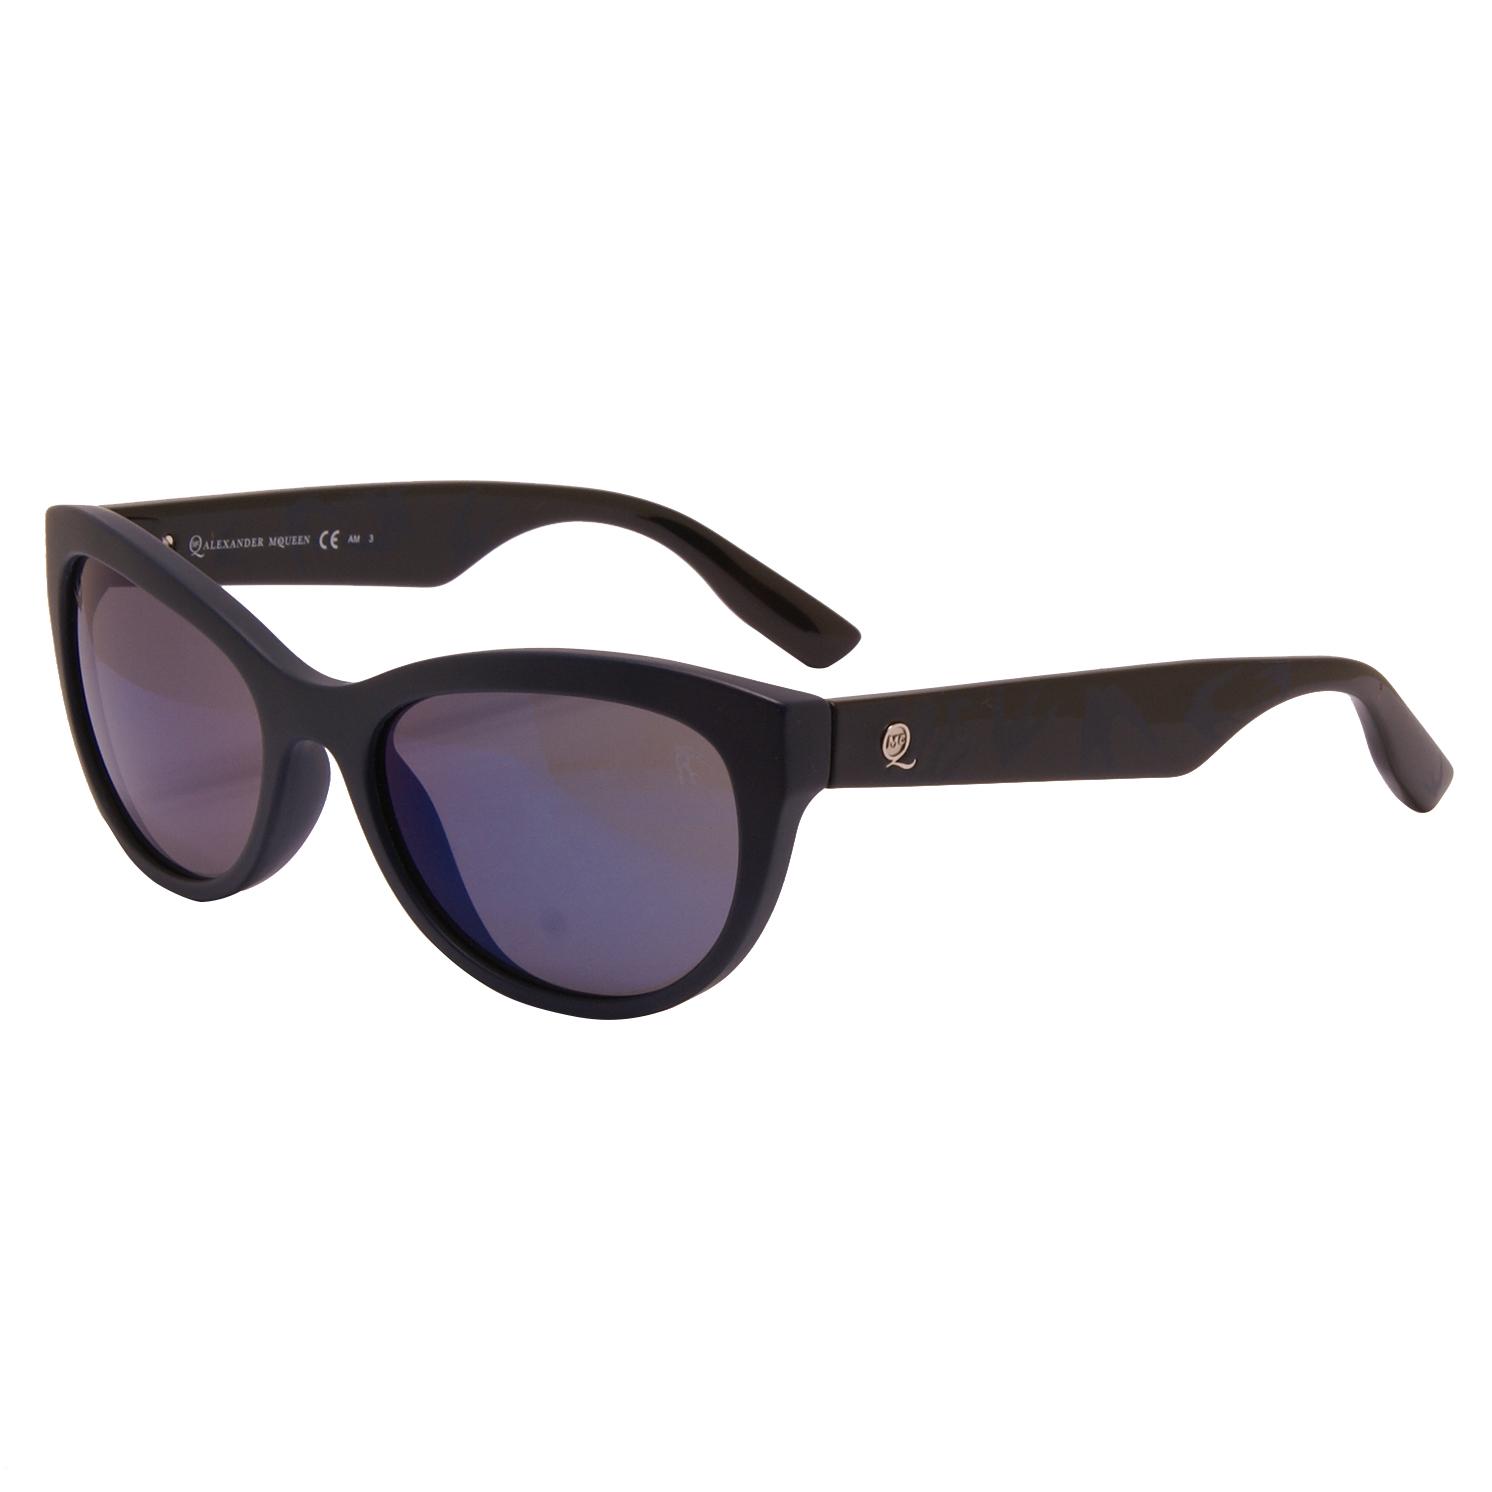 Alexander McQueen – Blue Swallow Design Classic Sunglasses with Case